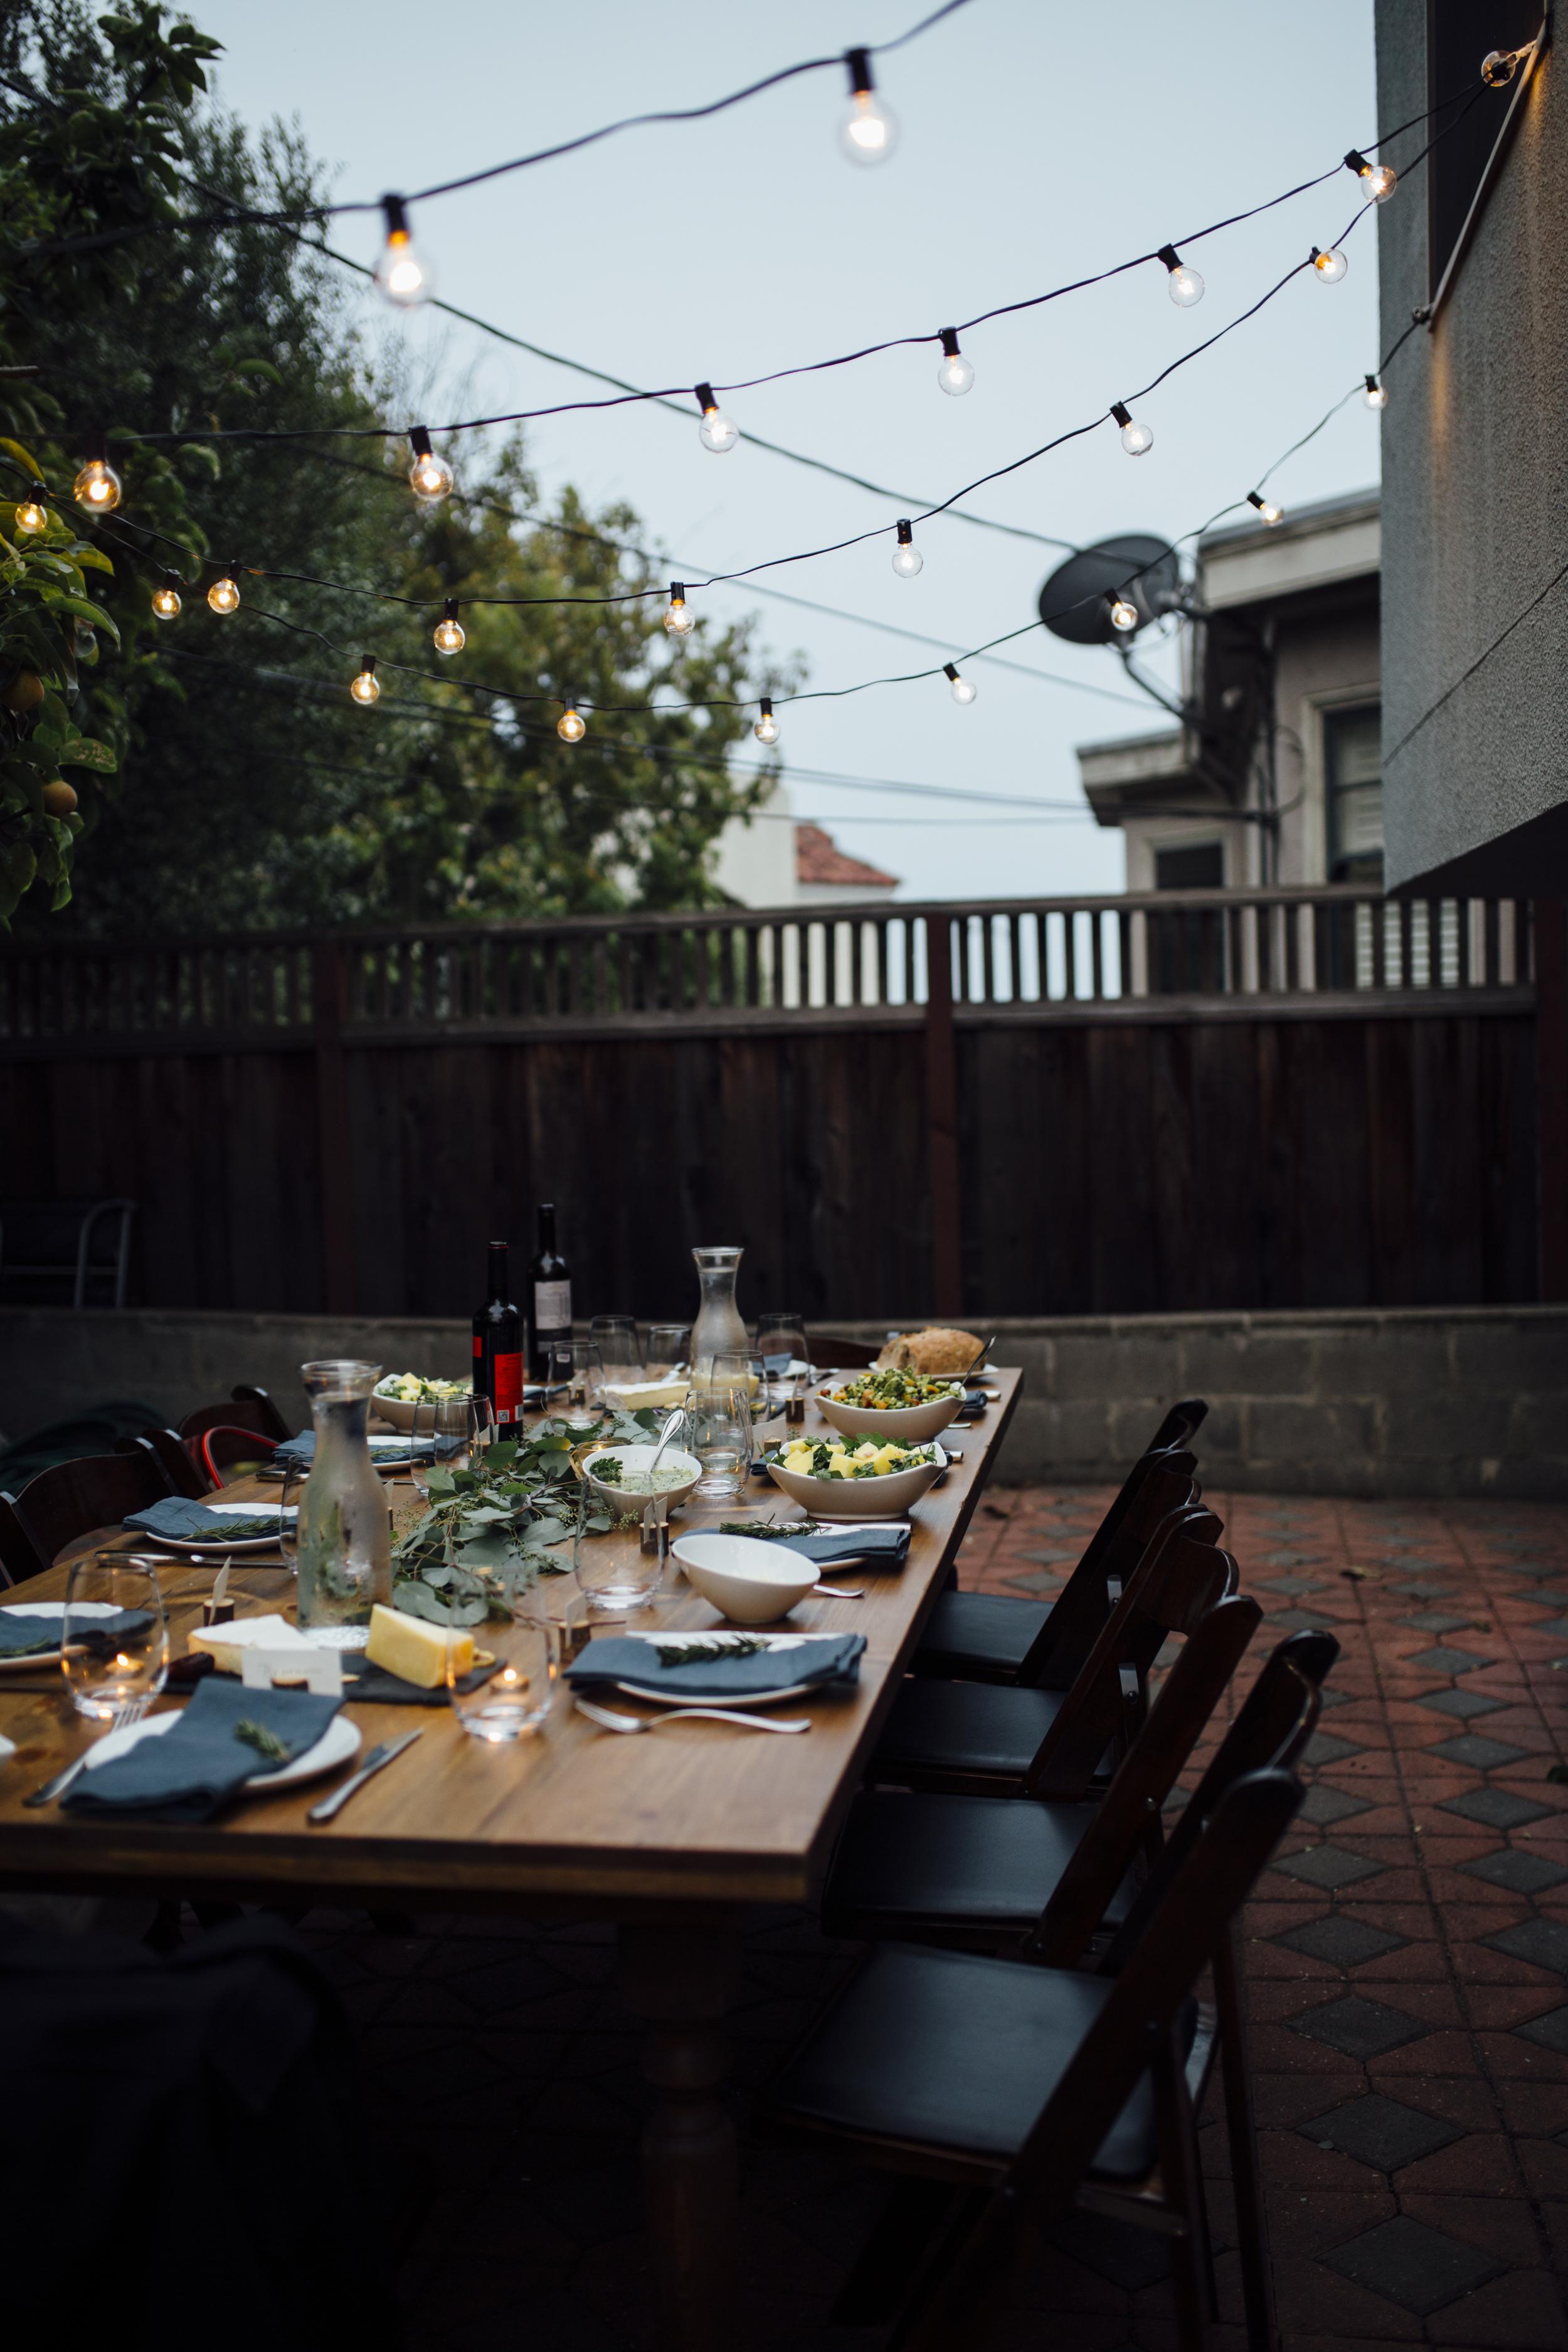 Intimate Backyard Dinner Party   Styled Shoot   Nataly Zigdon Photography   San Francisco